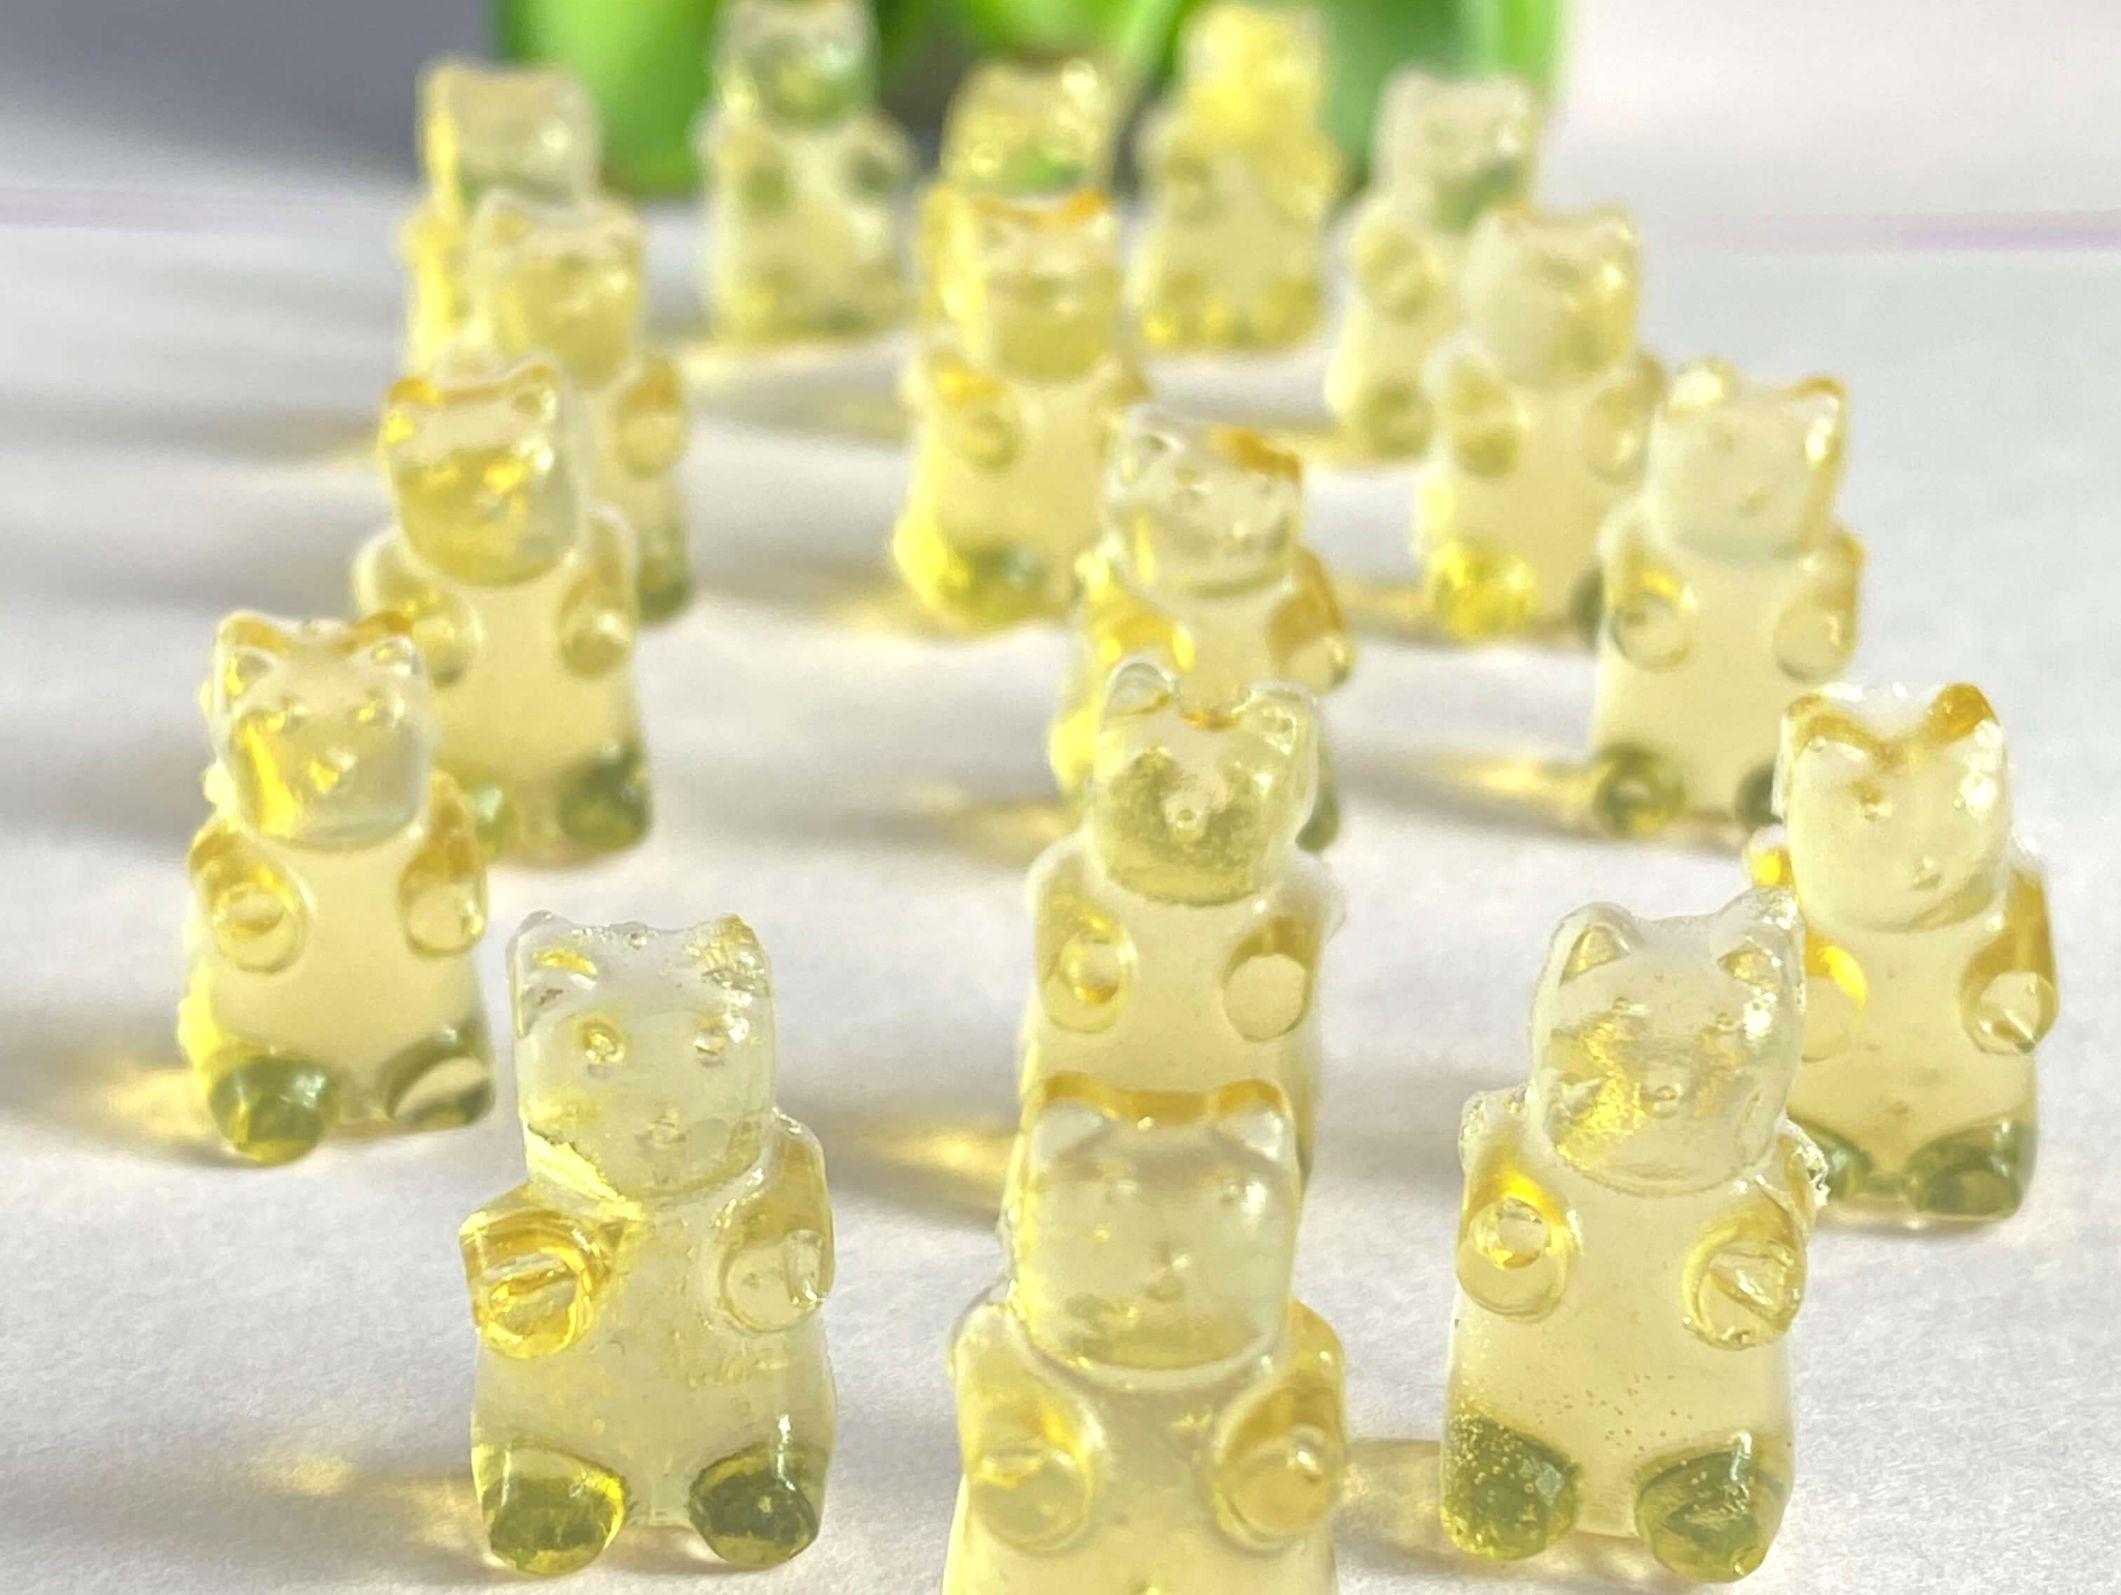 Gelatin Gummy bear dog treats on table